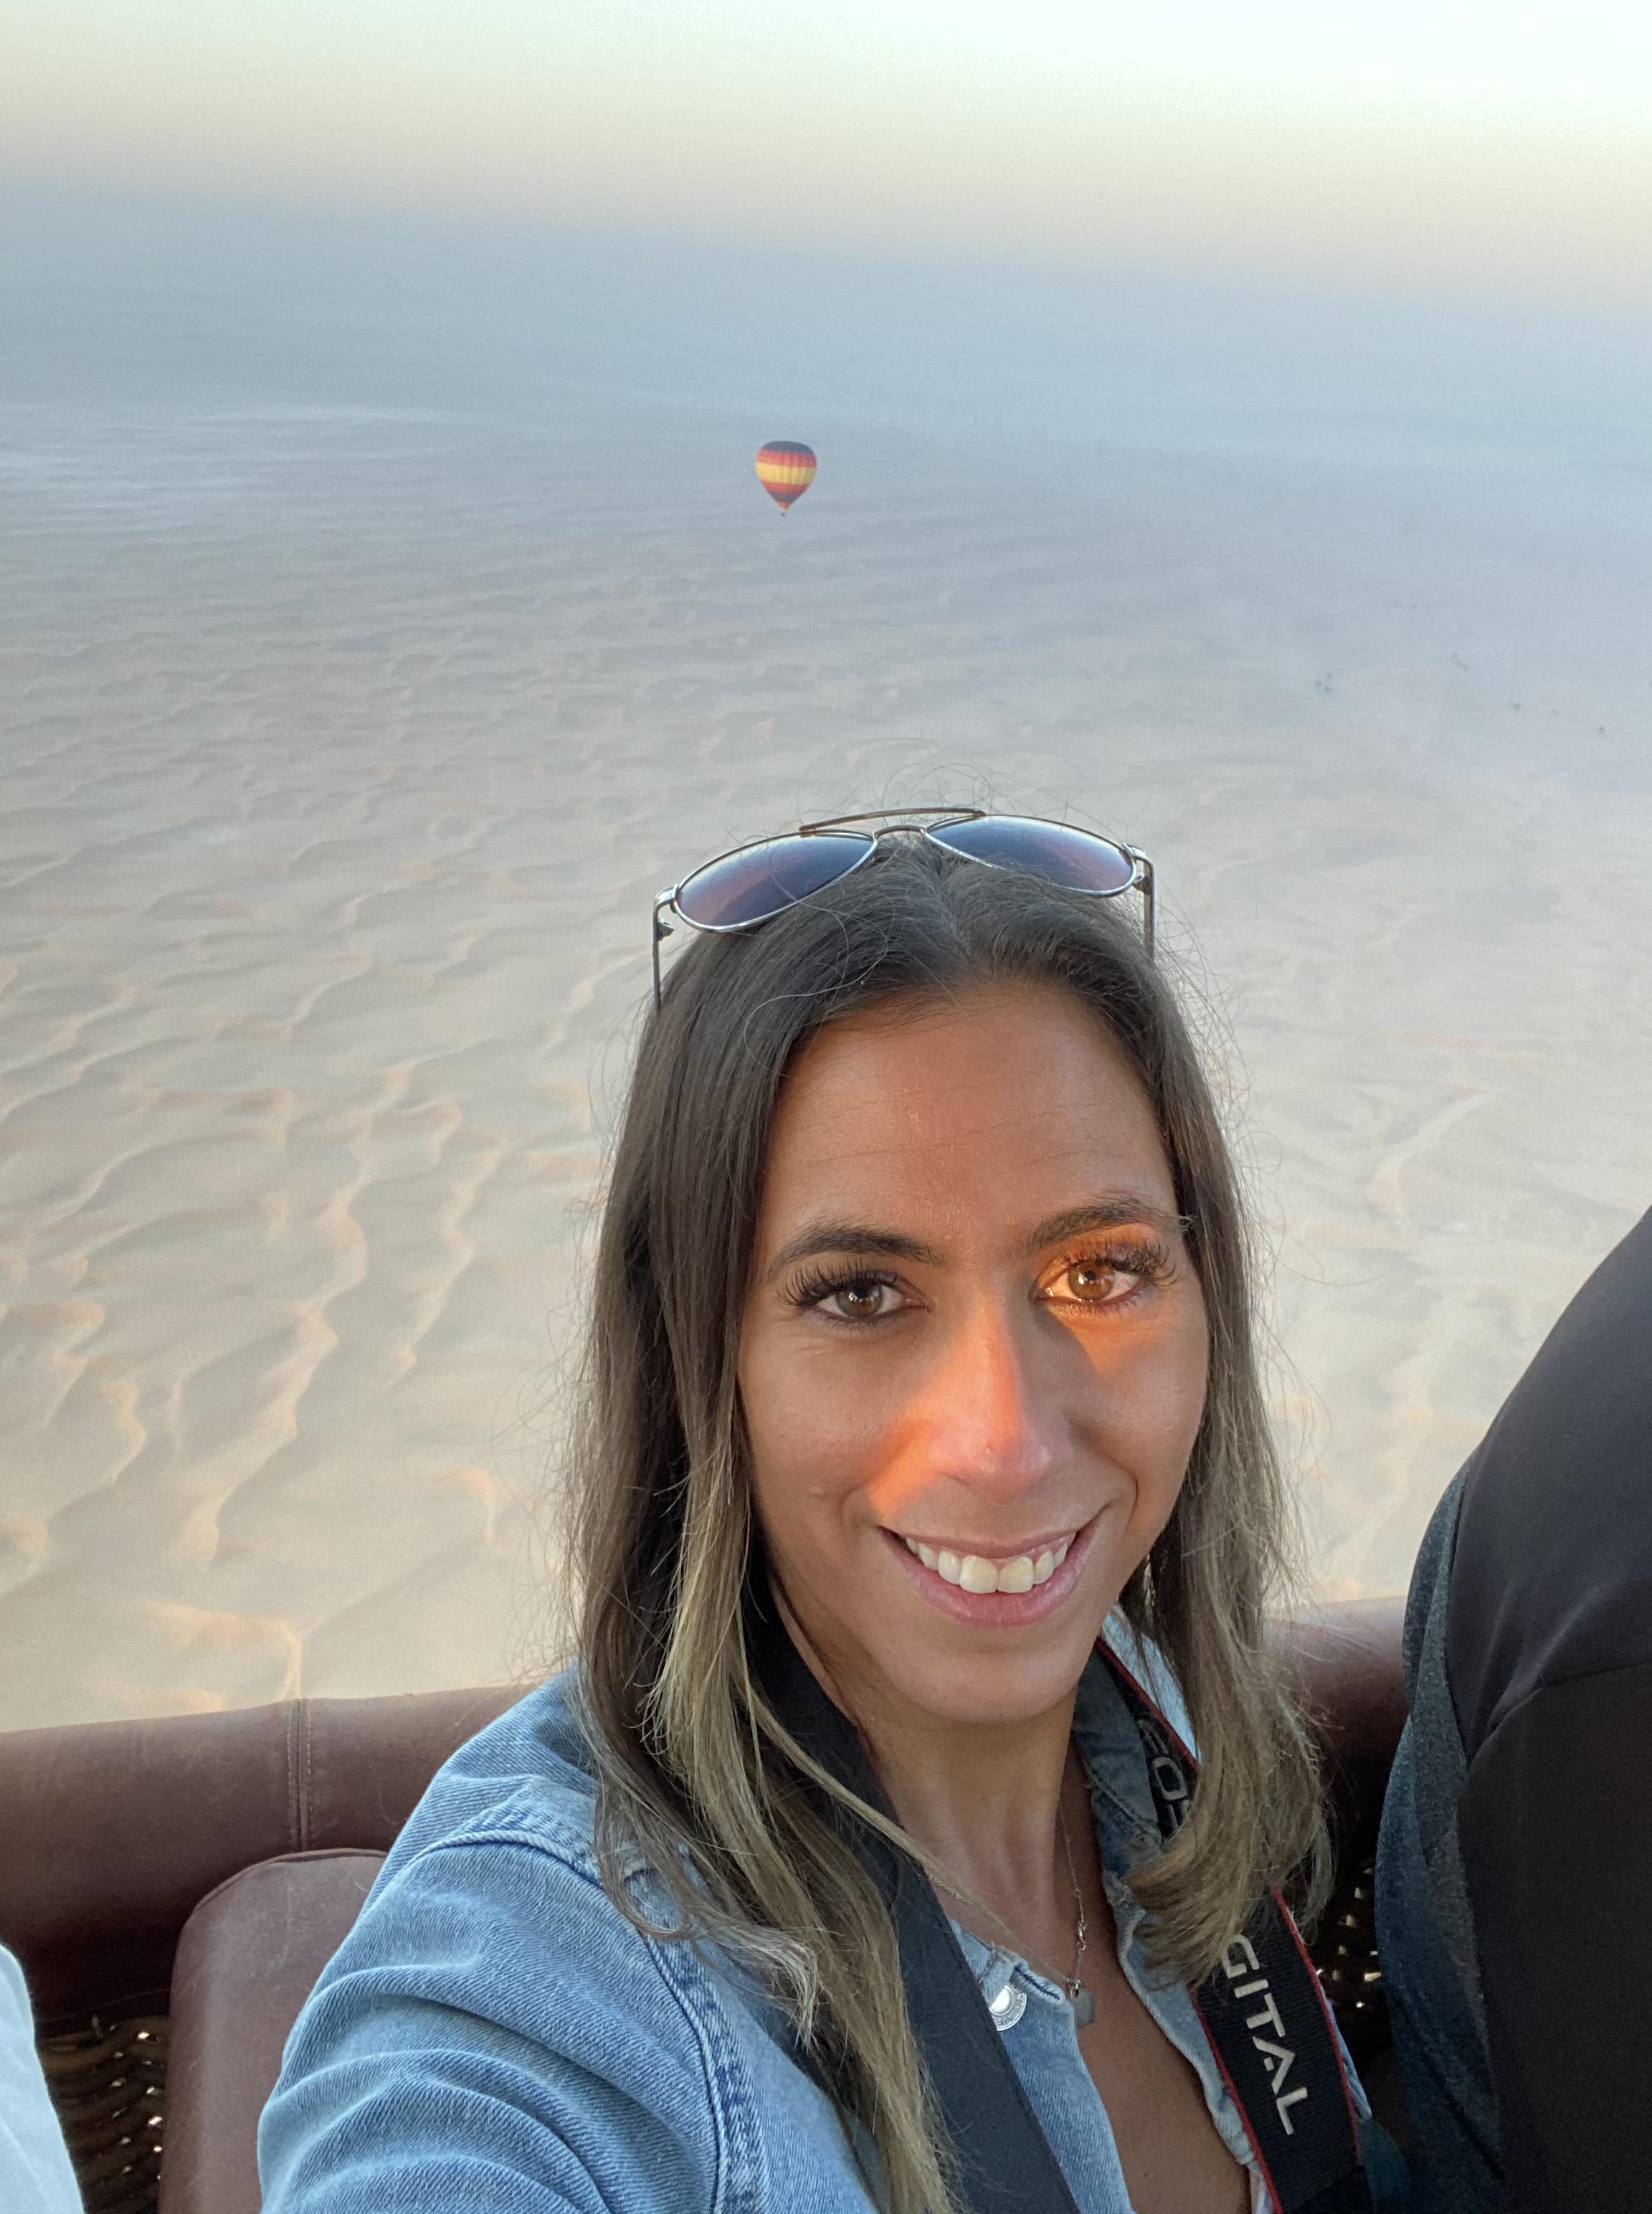 Dubai Travel Guide Scrubs2sweats